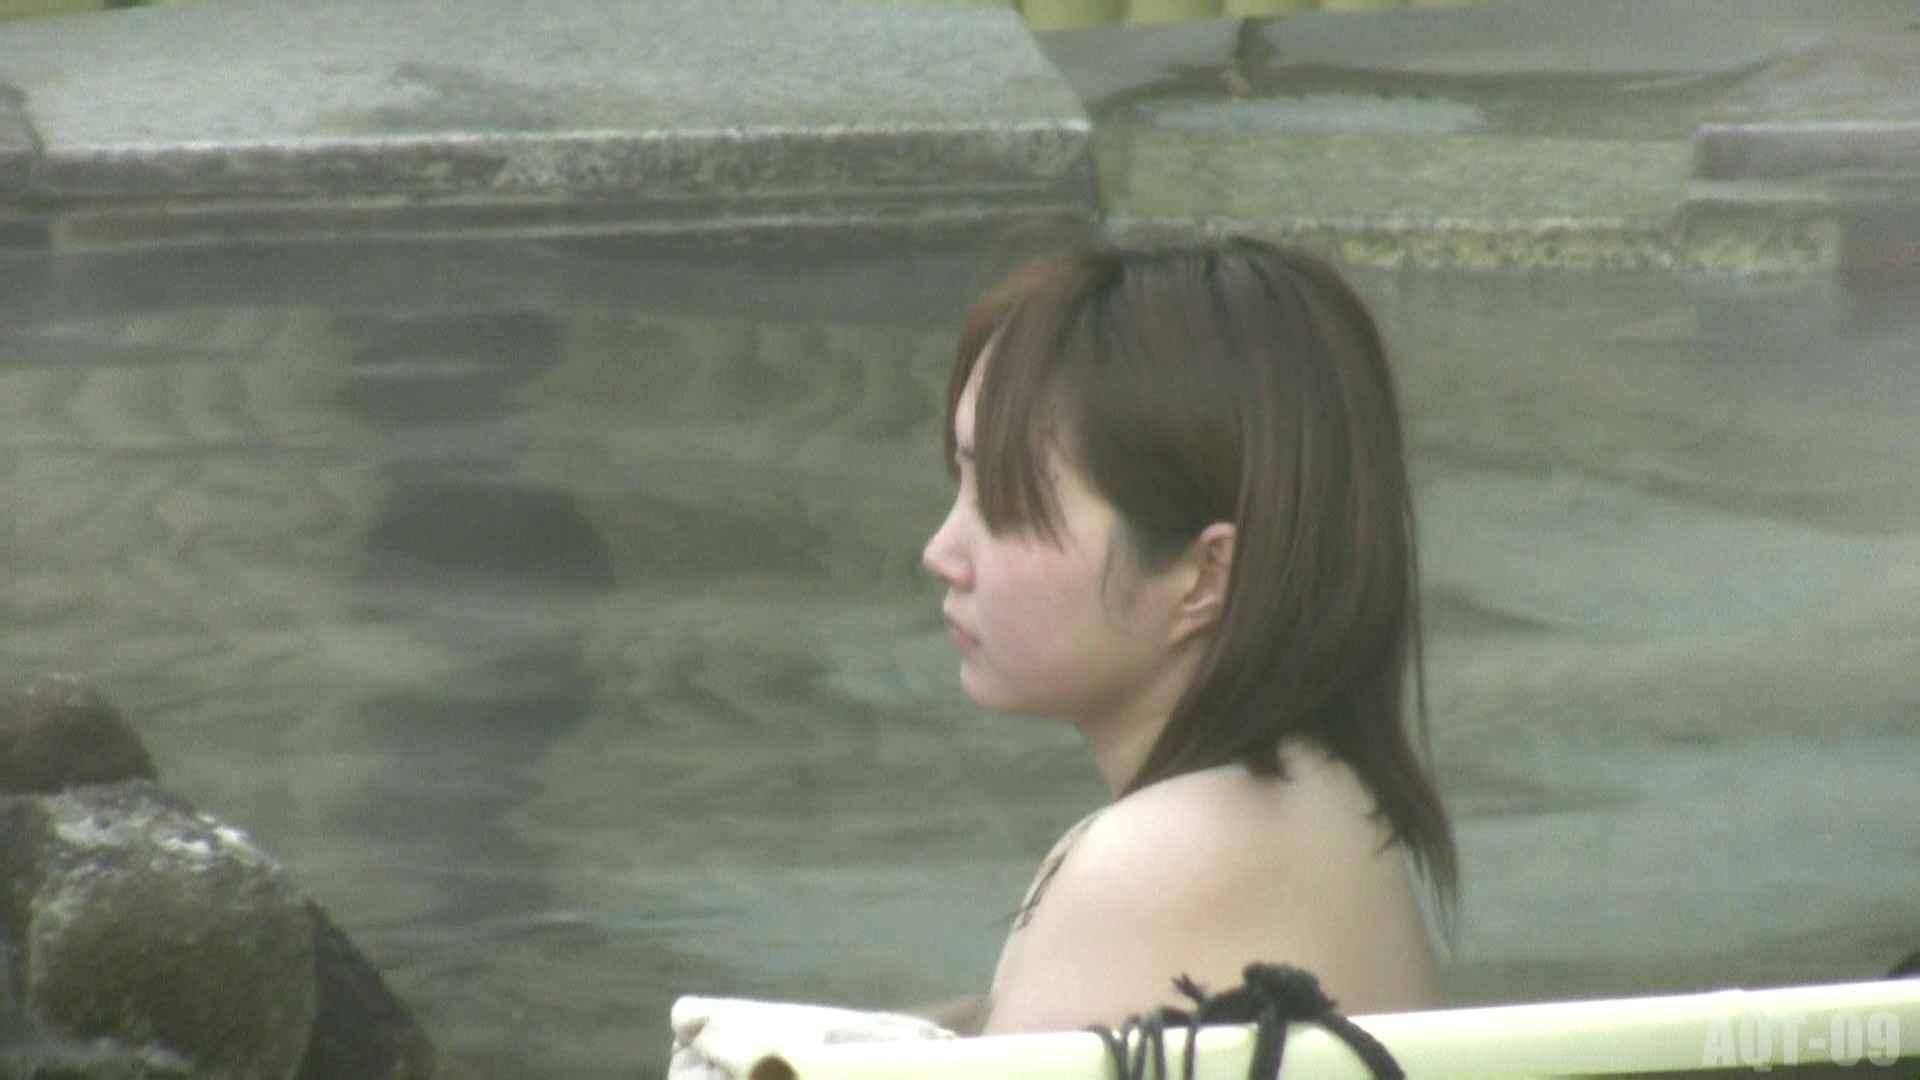 Aquaな露天風呂Vol.781 0 | 0  48連発 17